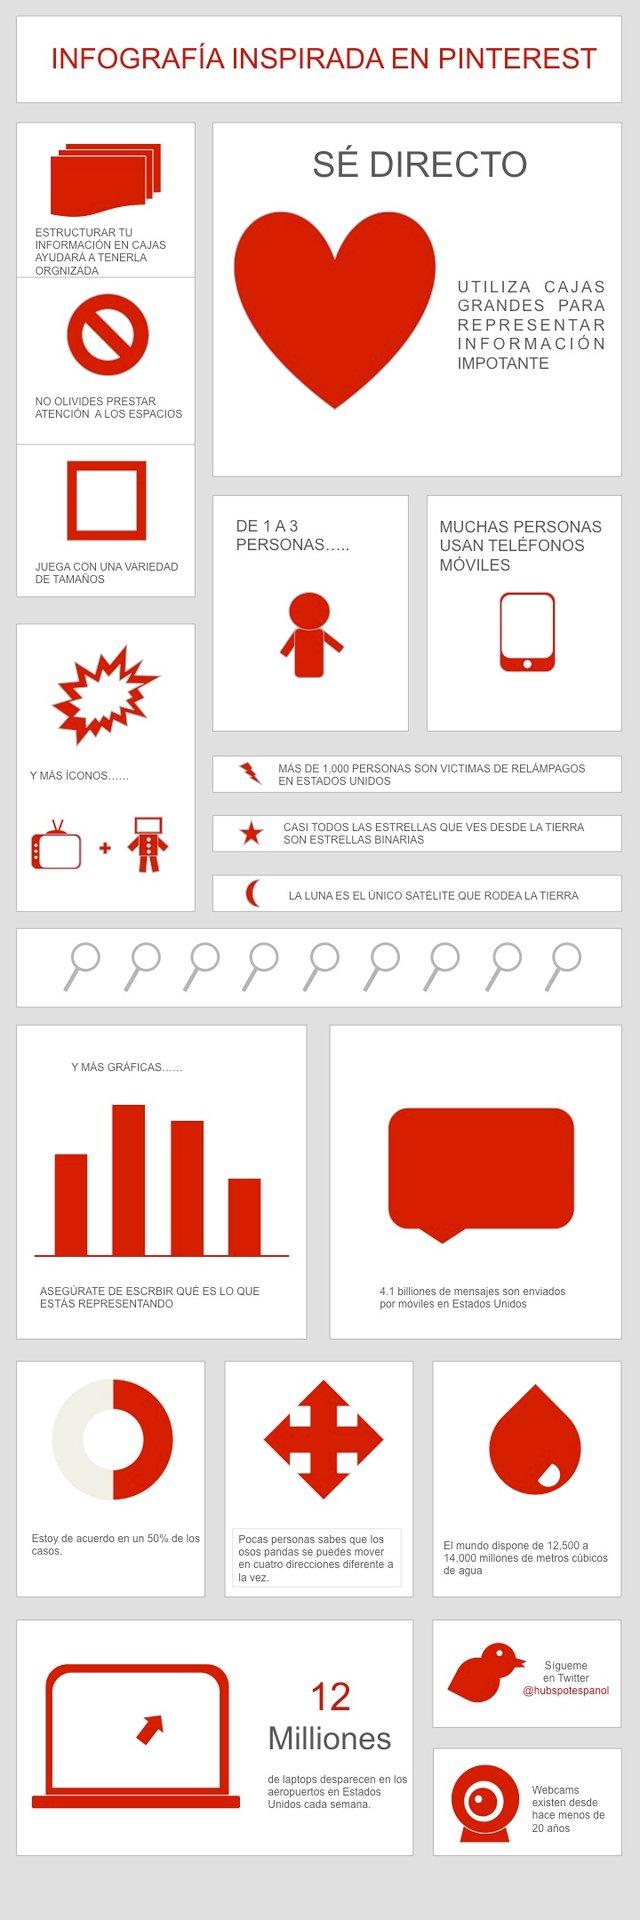 plantilla gratis para hacer infografías en Power Point